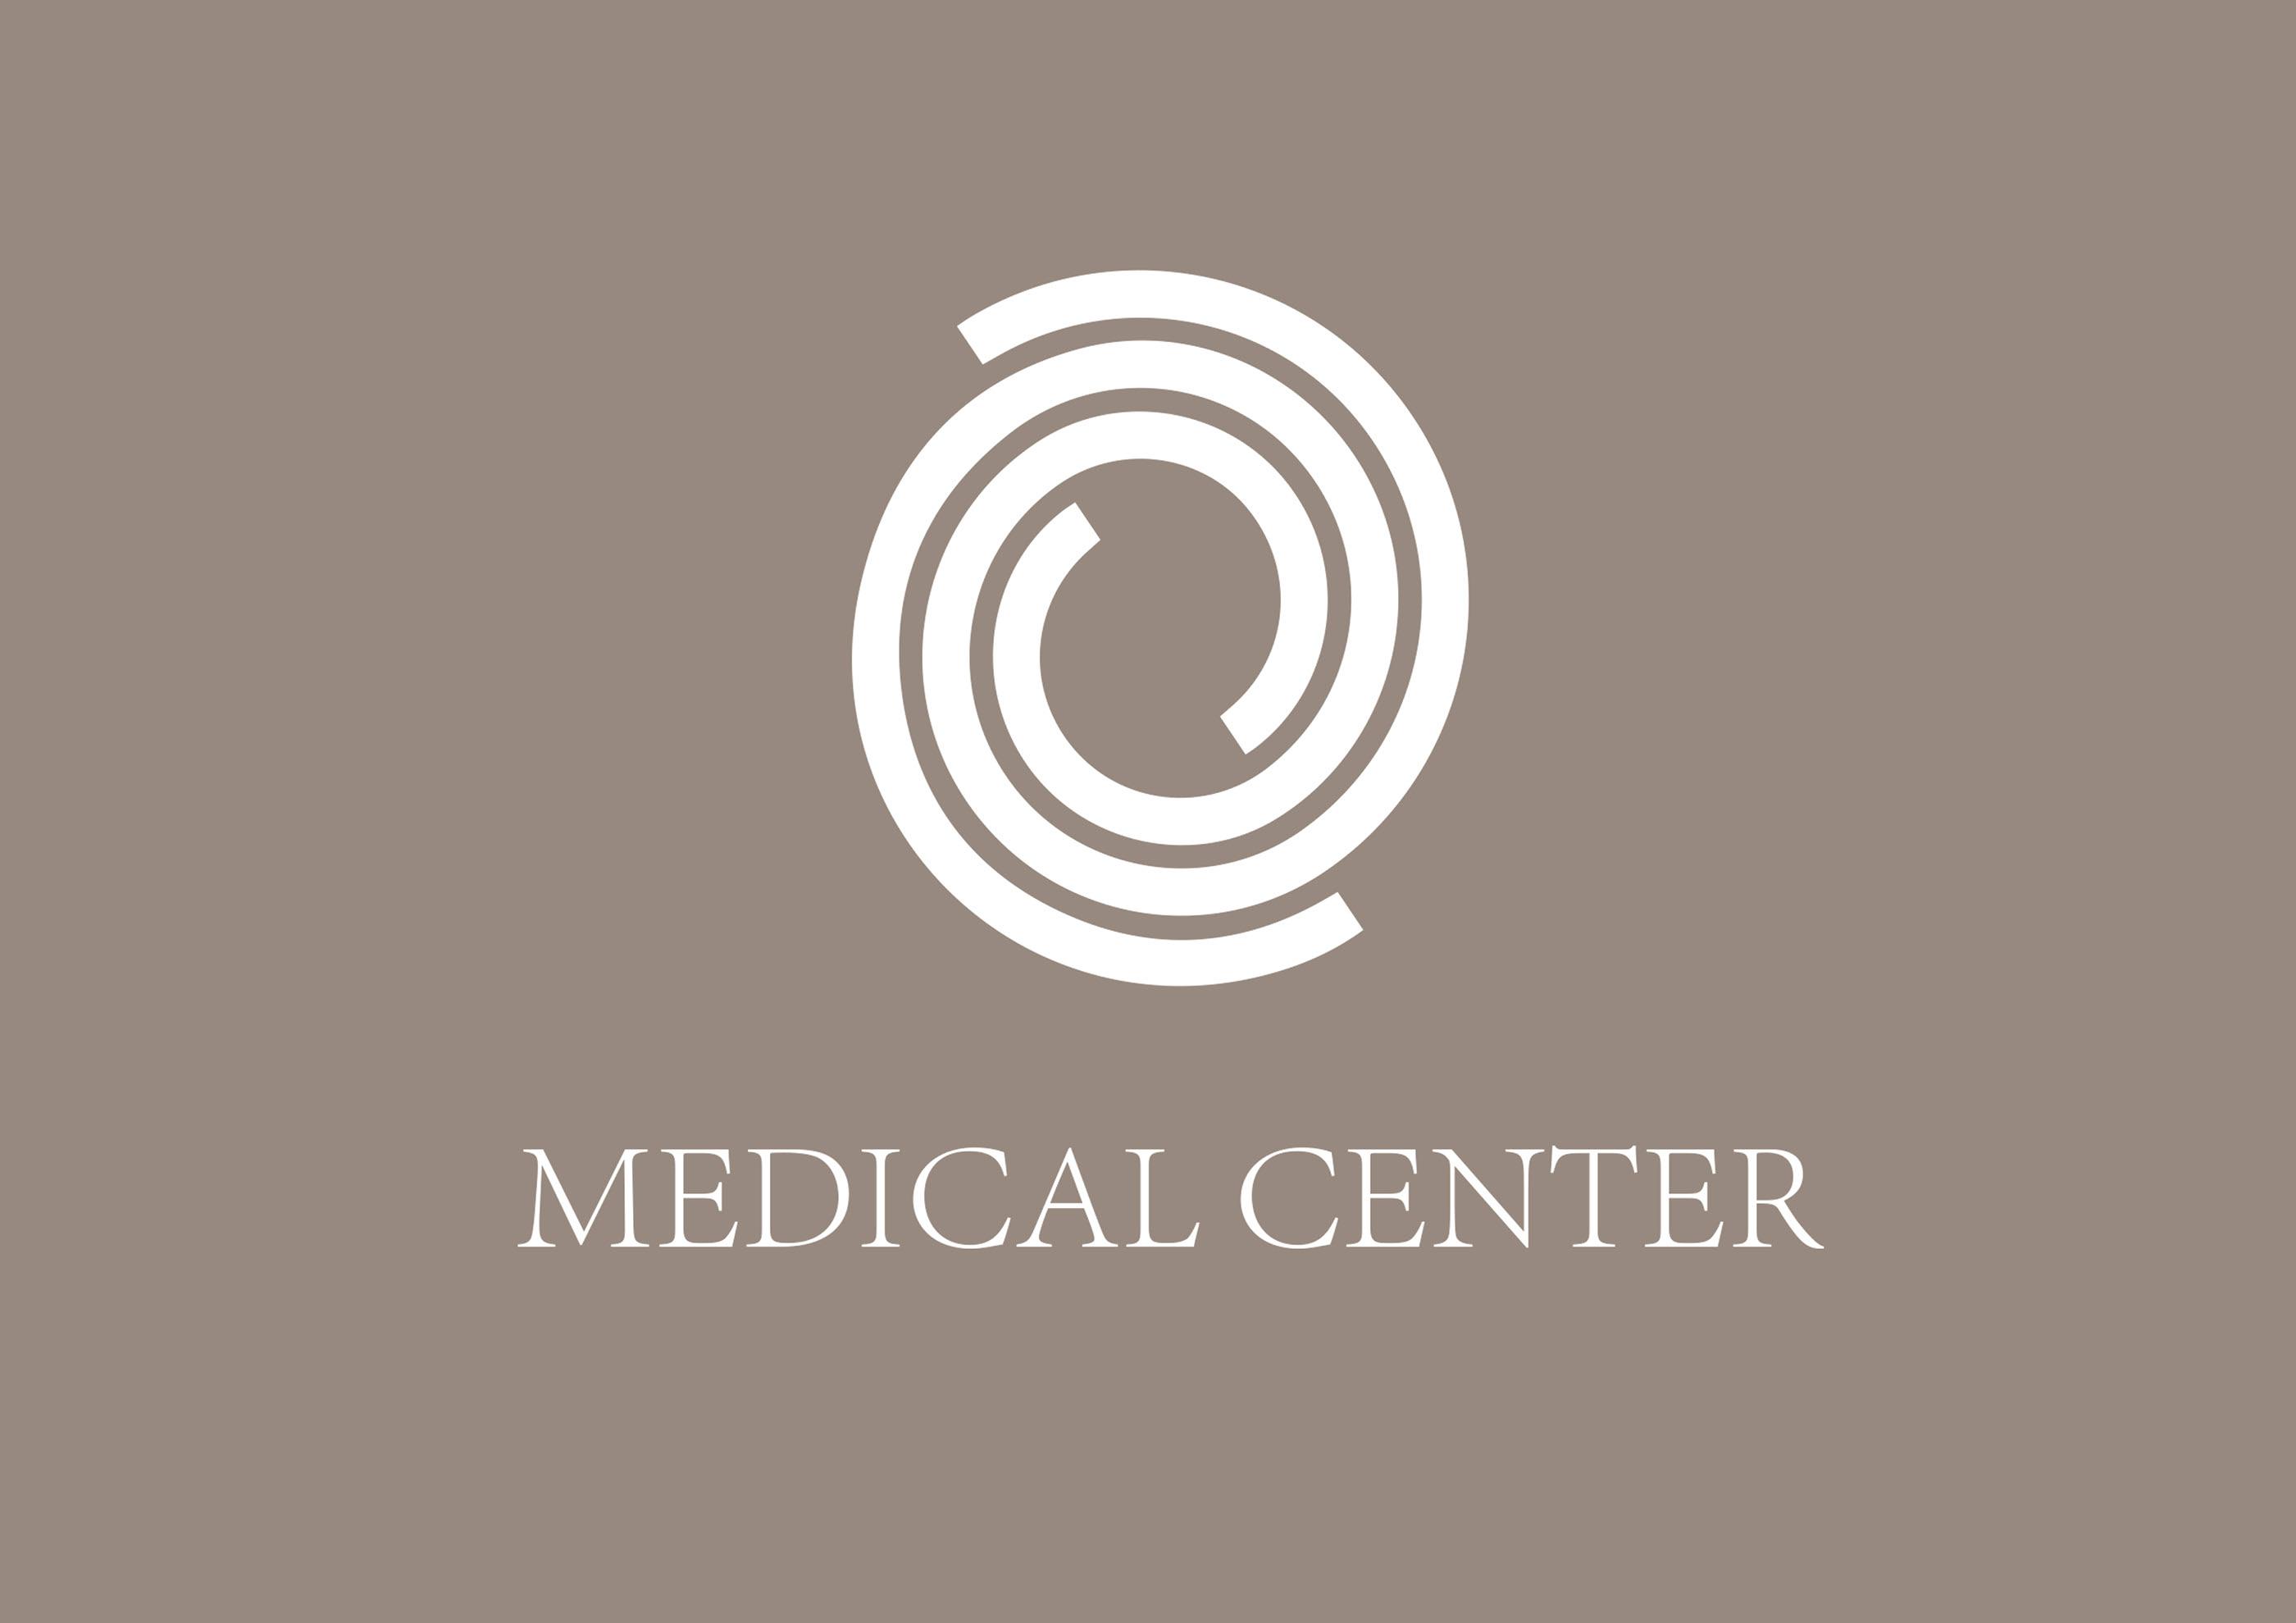 Логотип медицинского центра.